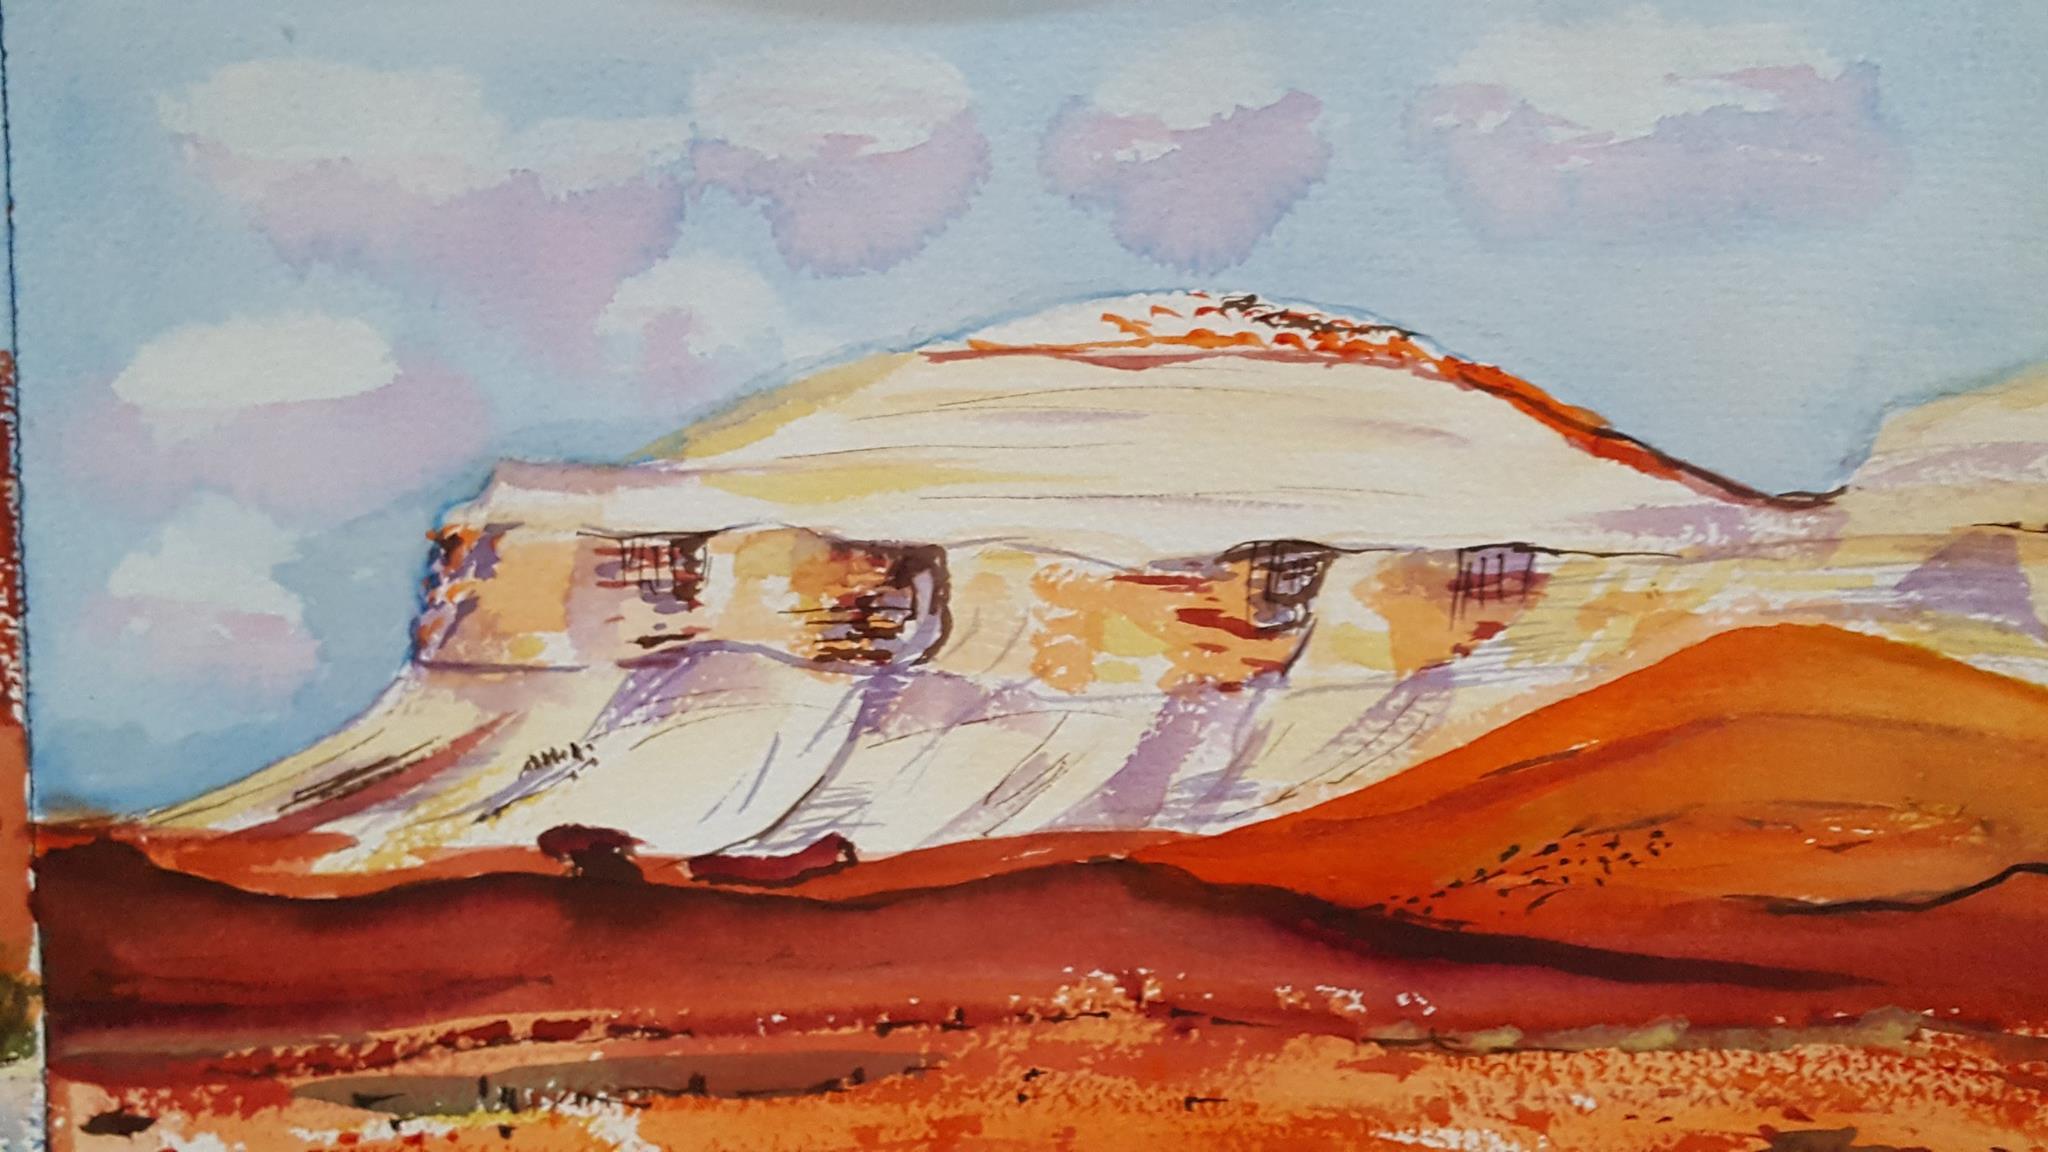 Australian desert painted by Josie.